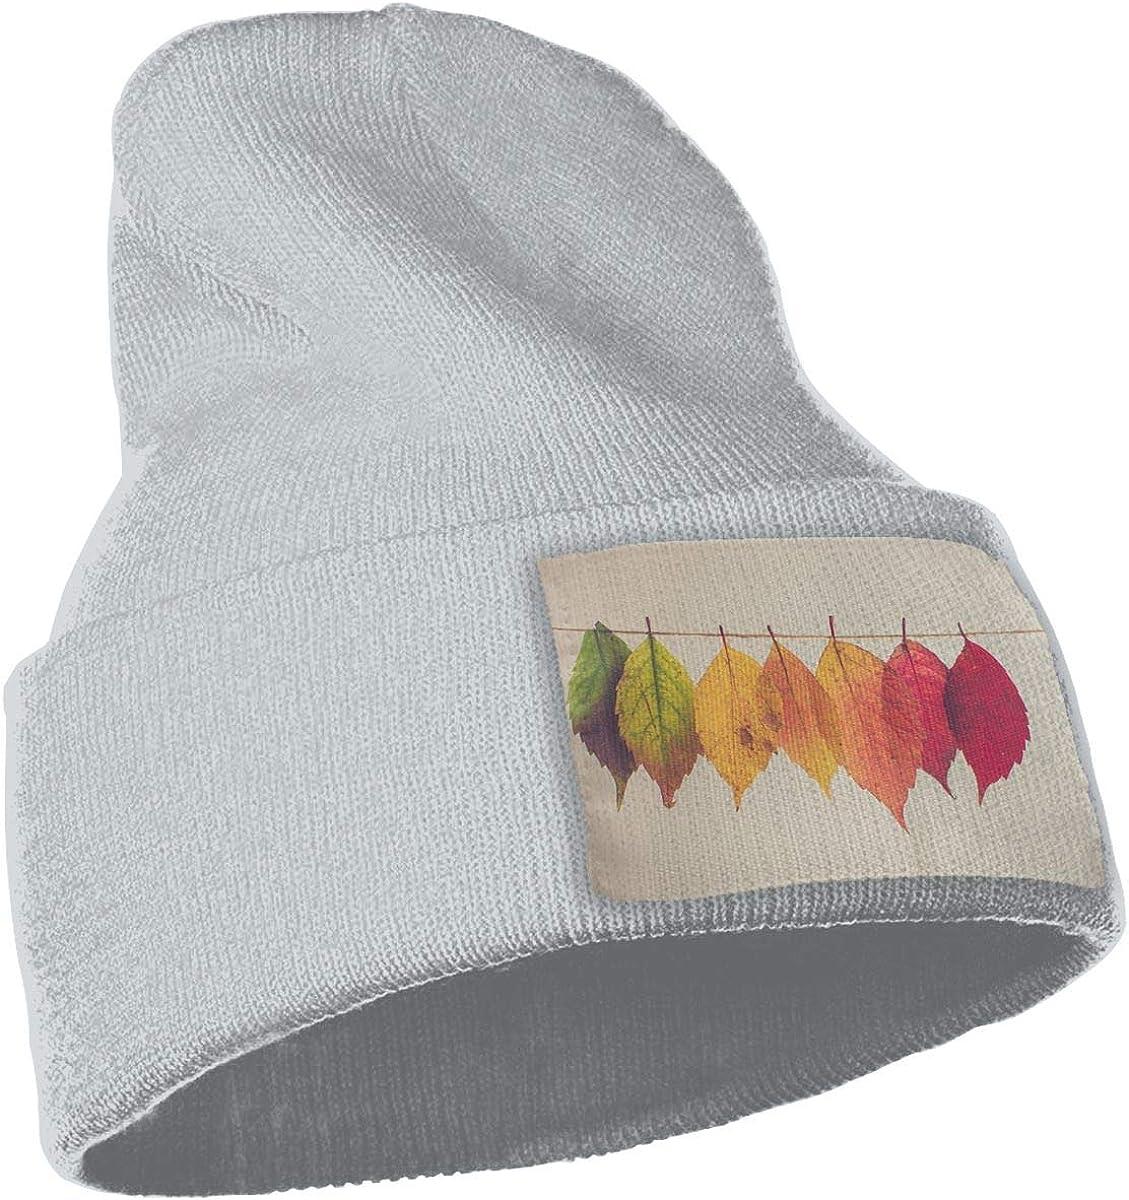 Yubb7E Leaves-Fall-Cords Warm Knit Winter Solid Beanie Hat Unisex Skull Cap